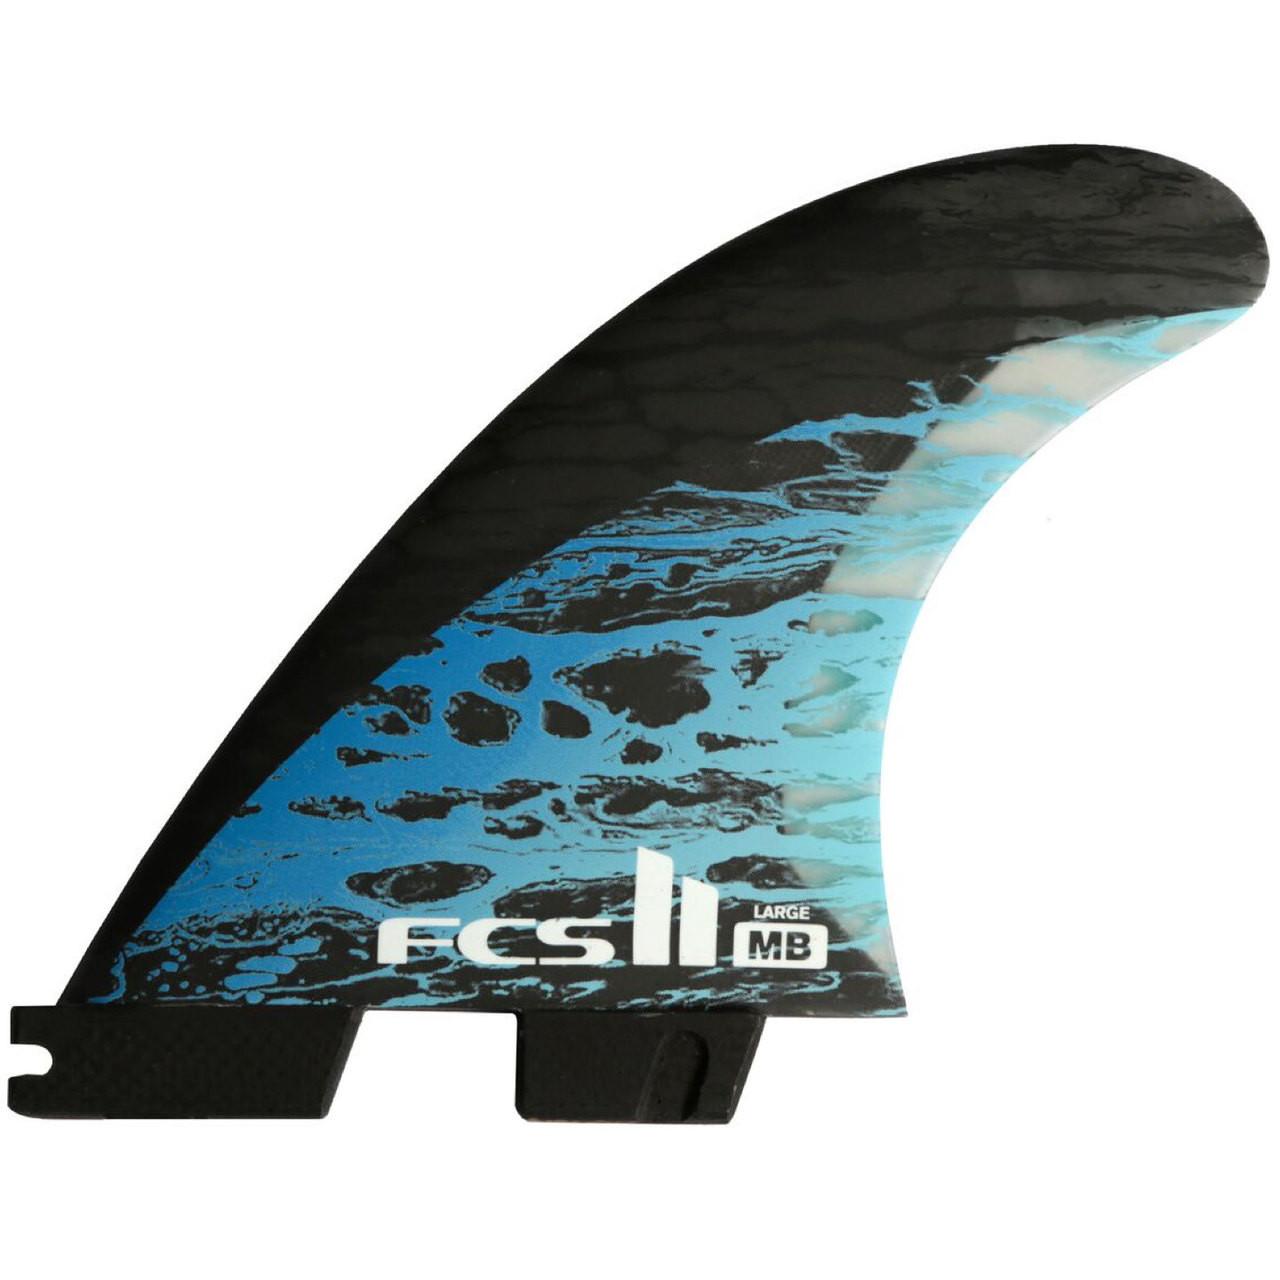 Buy FCS 2 Matt Biolos NEW Large Thruster Fin Set Online  182ab71ec